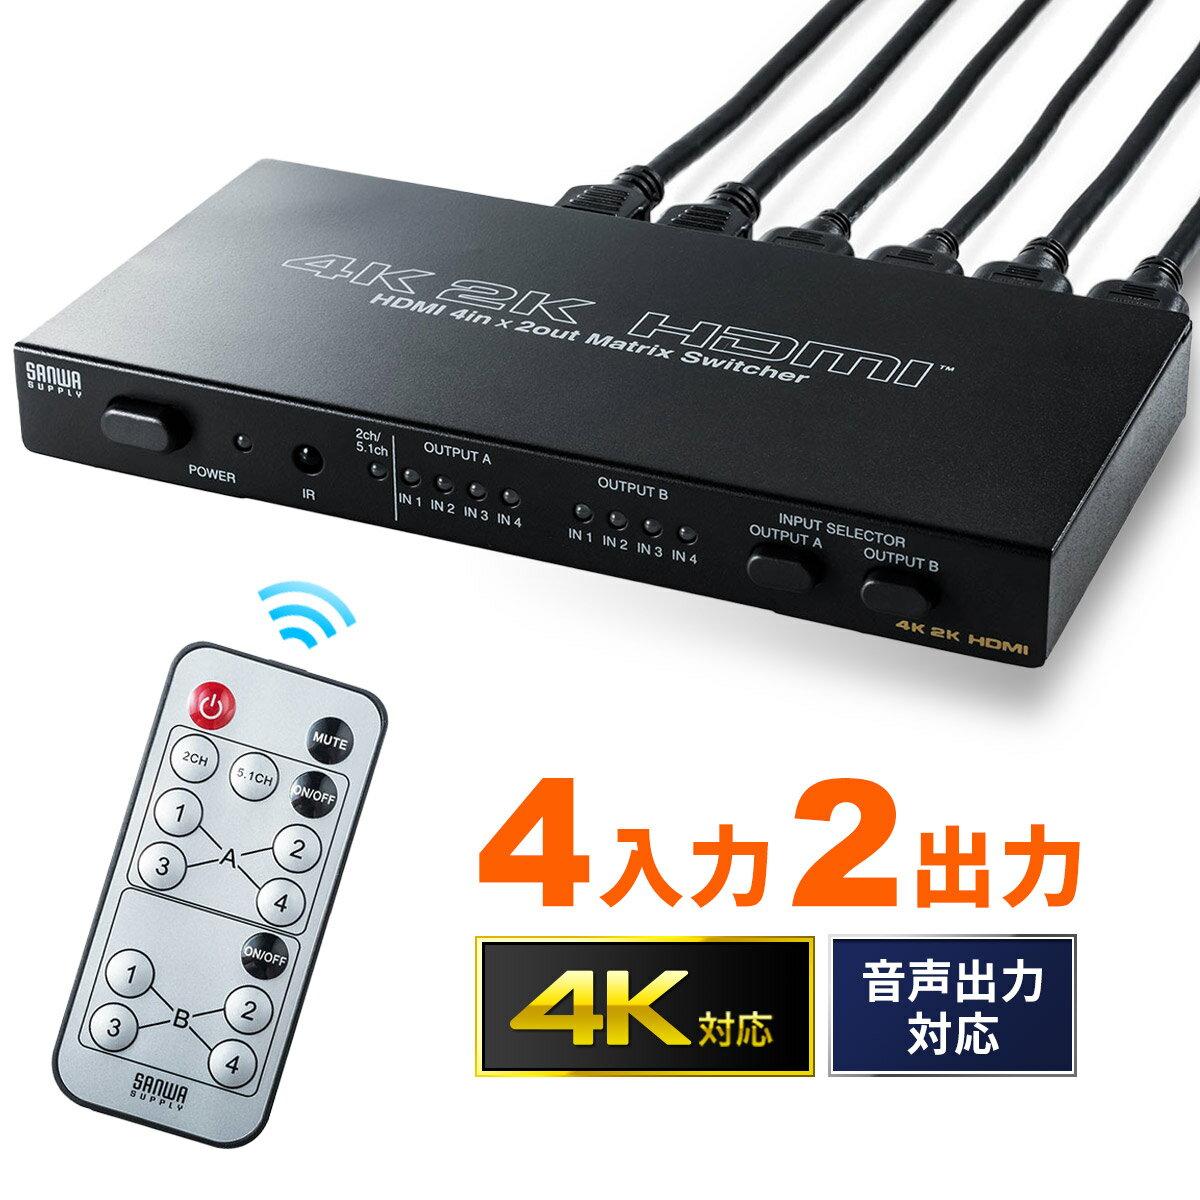 HDMI切替器 HDMIマトリックス切替器 4入力2出力 4K/30Hz対応 リモコン付き 光・同軸デジタル出力付き HDMI セレクター 切替機 手動切替 リモコン切替 HDMI分配器 切り替え [400-SW027]【サンワダイレクト限定品】【送料無料】